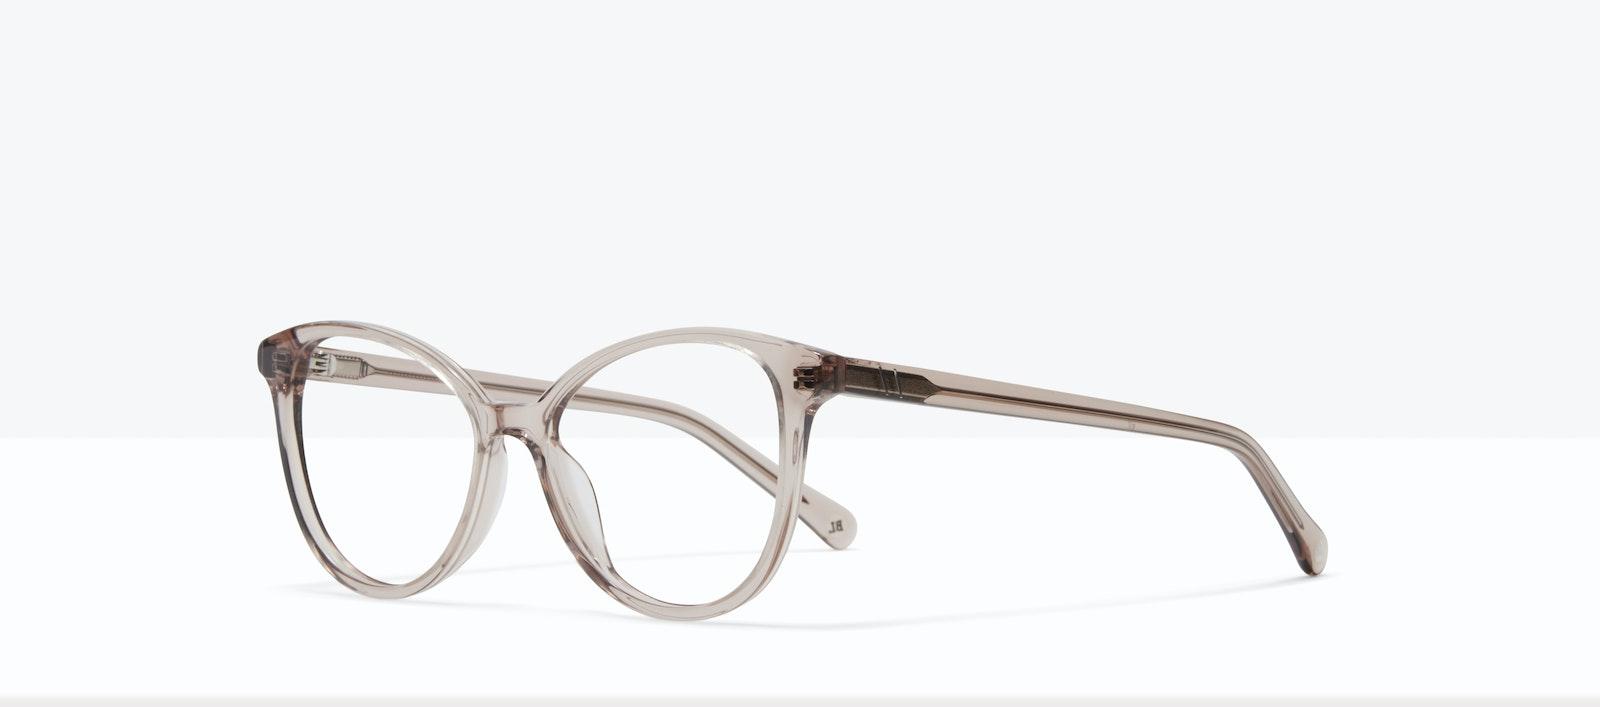 Affordable Fashion Glasses Cat Eye Eyeglasses Women Esprit L Sand Tilt